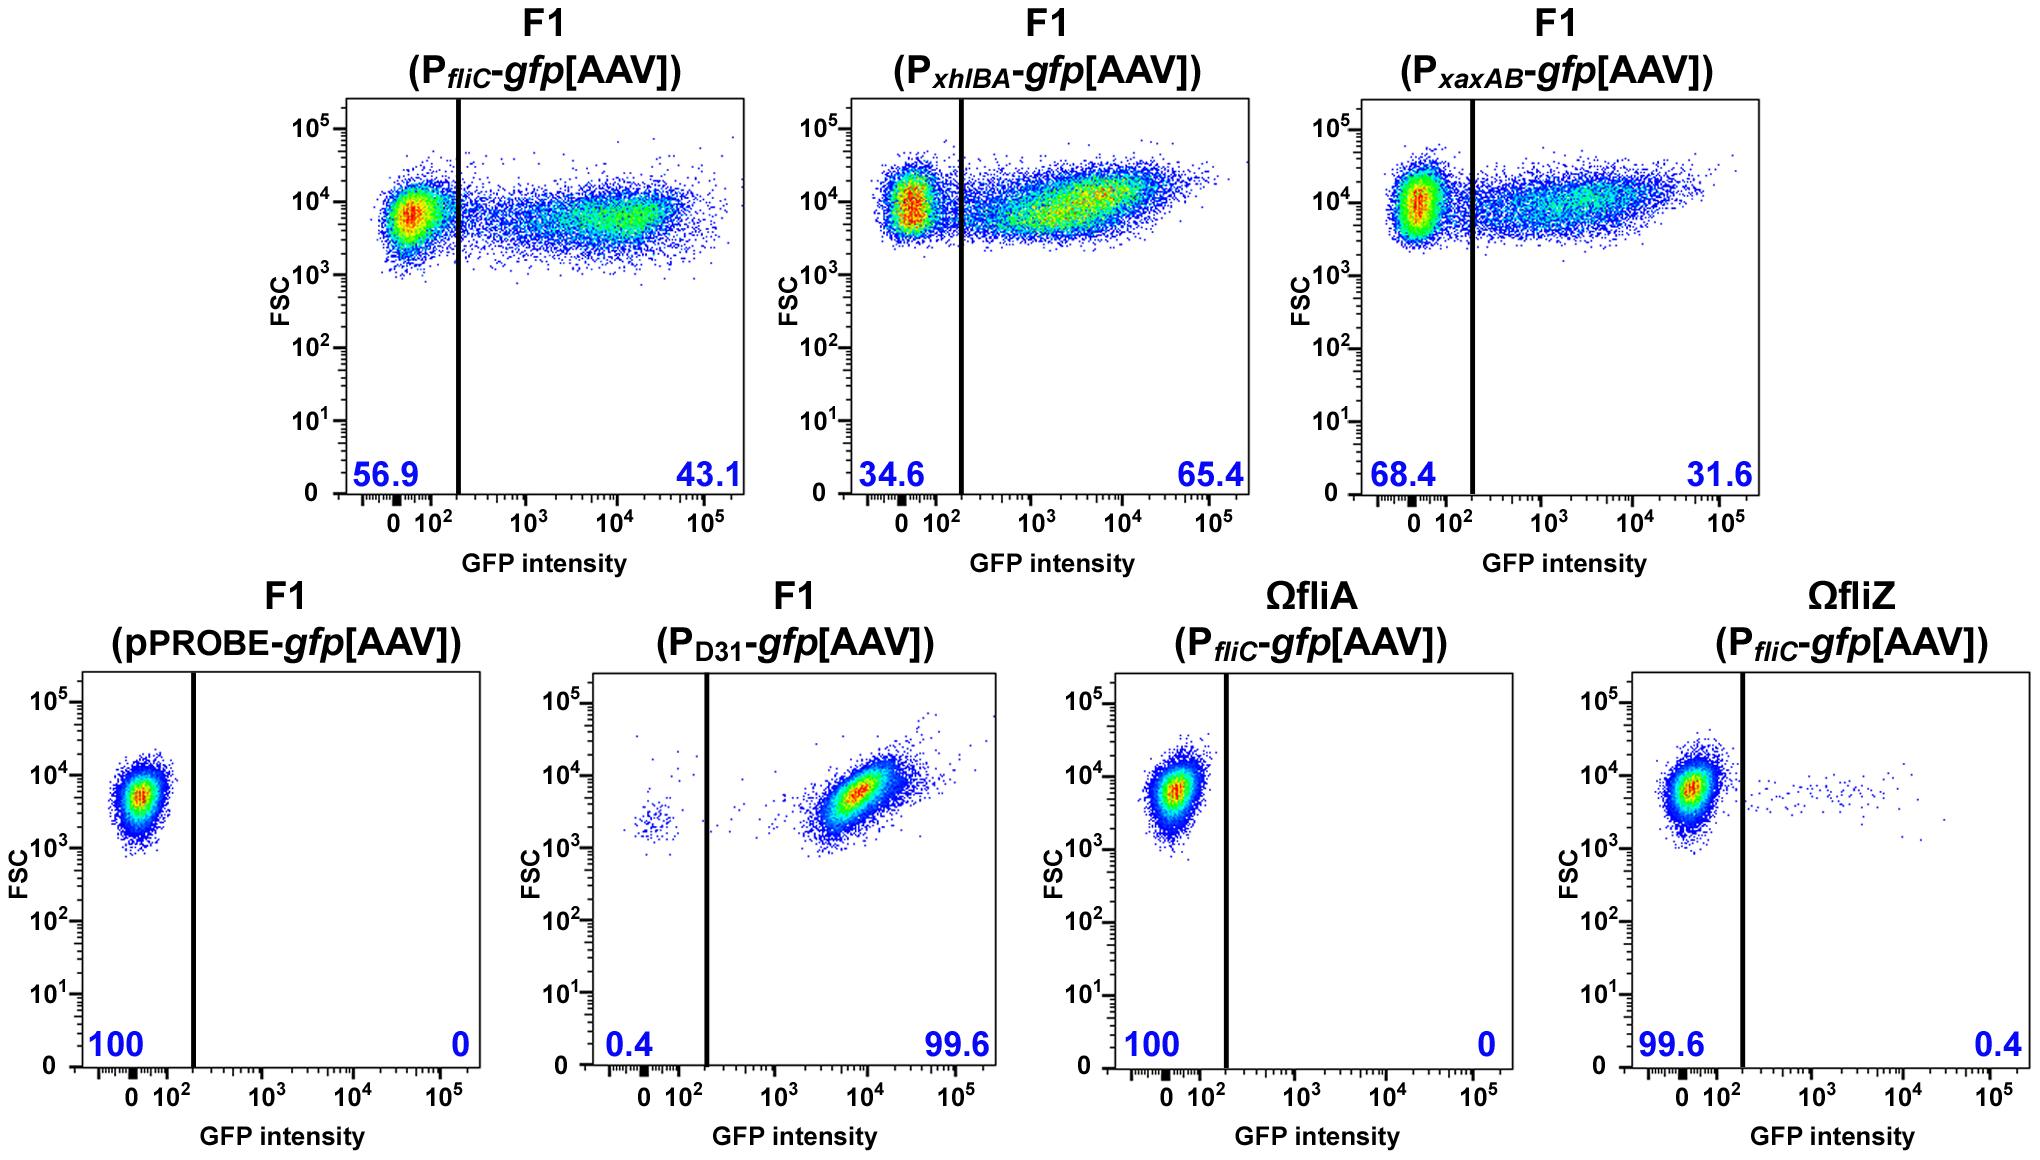 Bimodal expression of flagellin and hemolysin genes in <i>Xenorhabdus</i>.